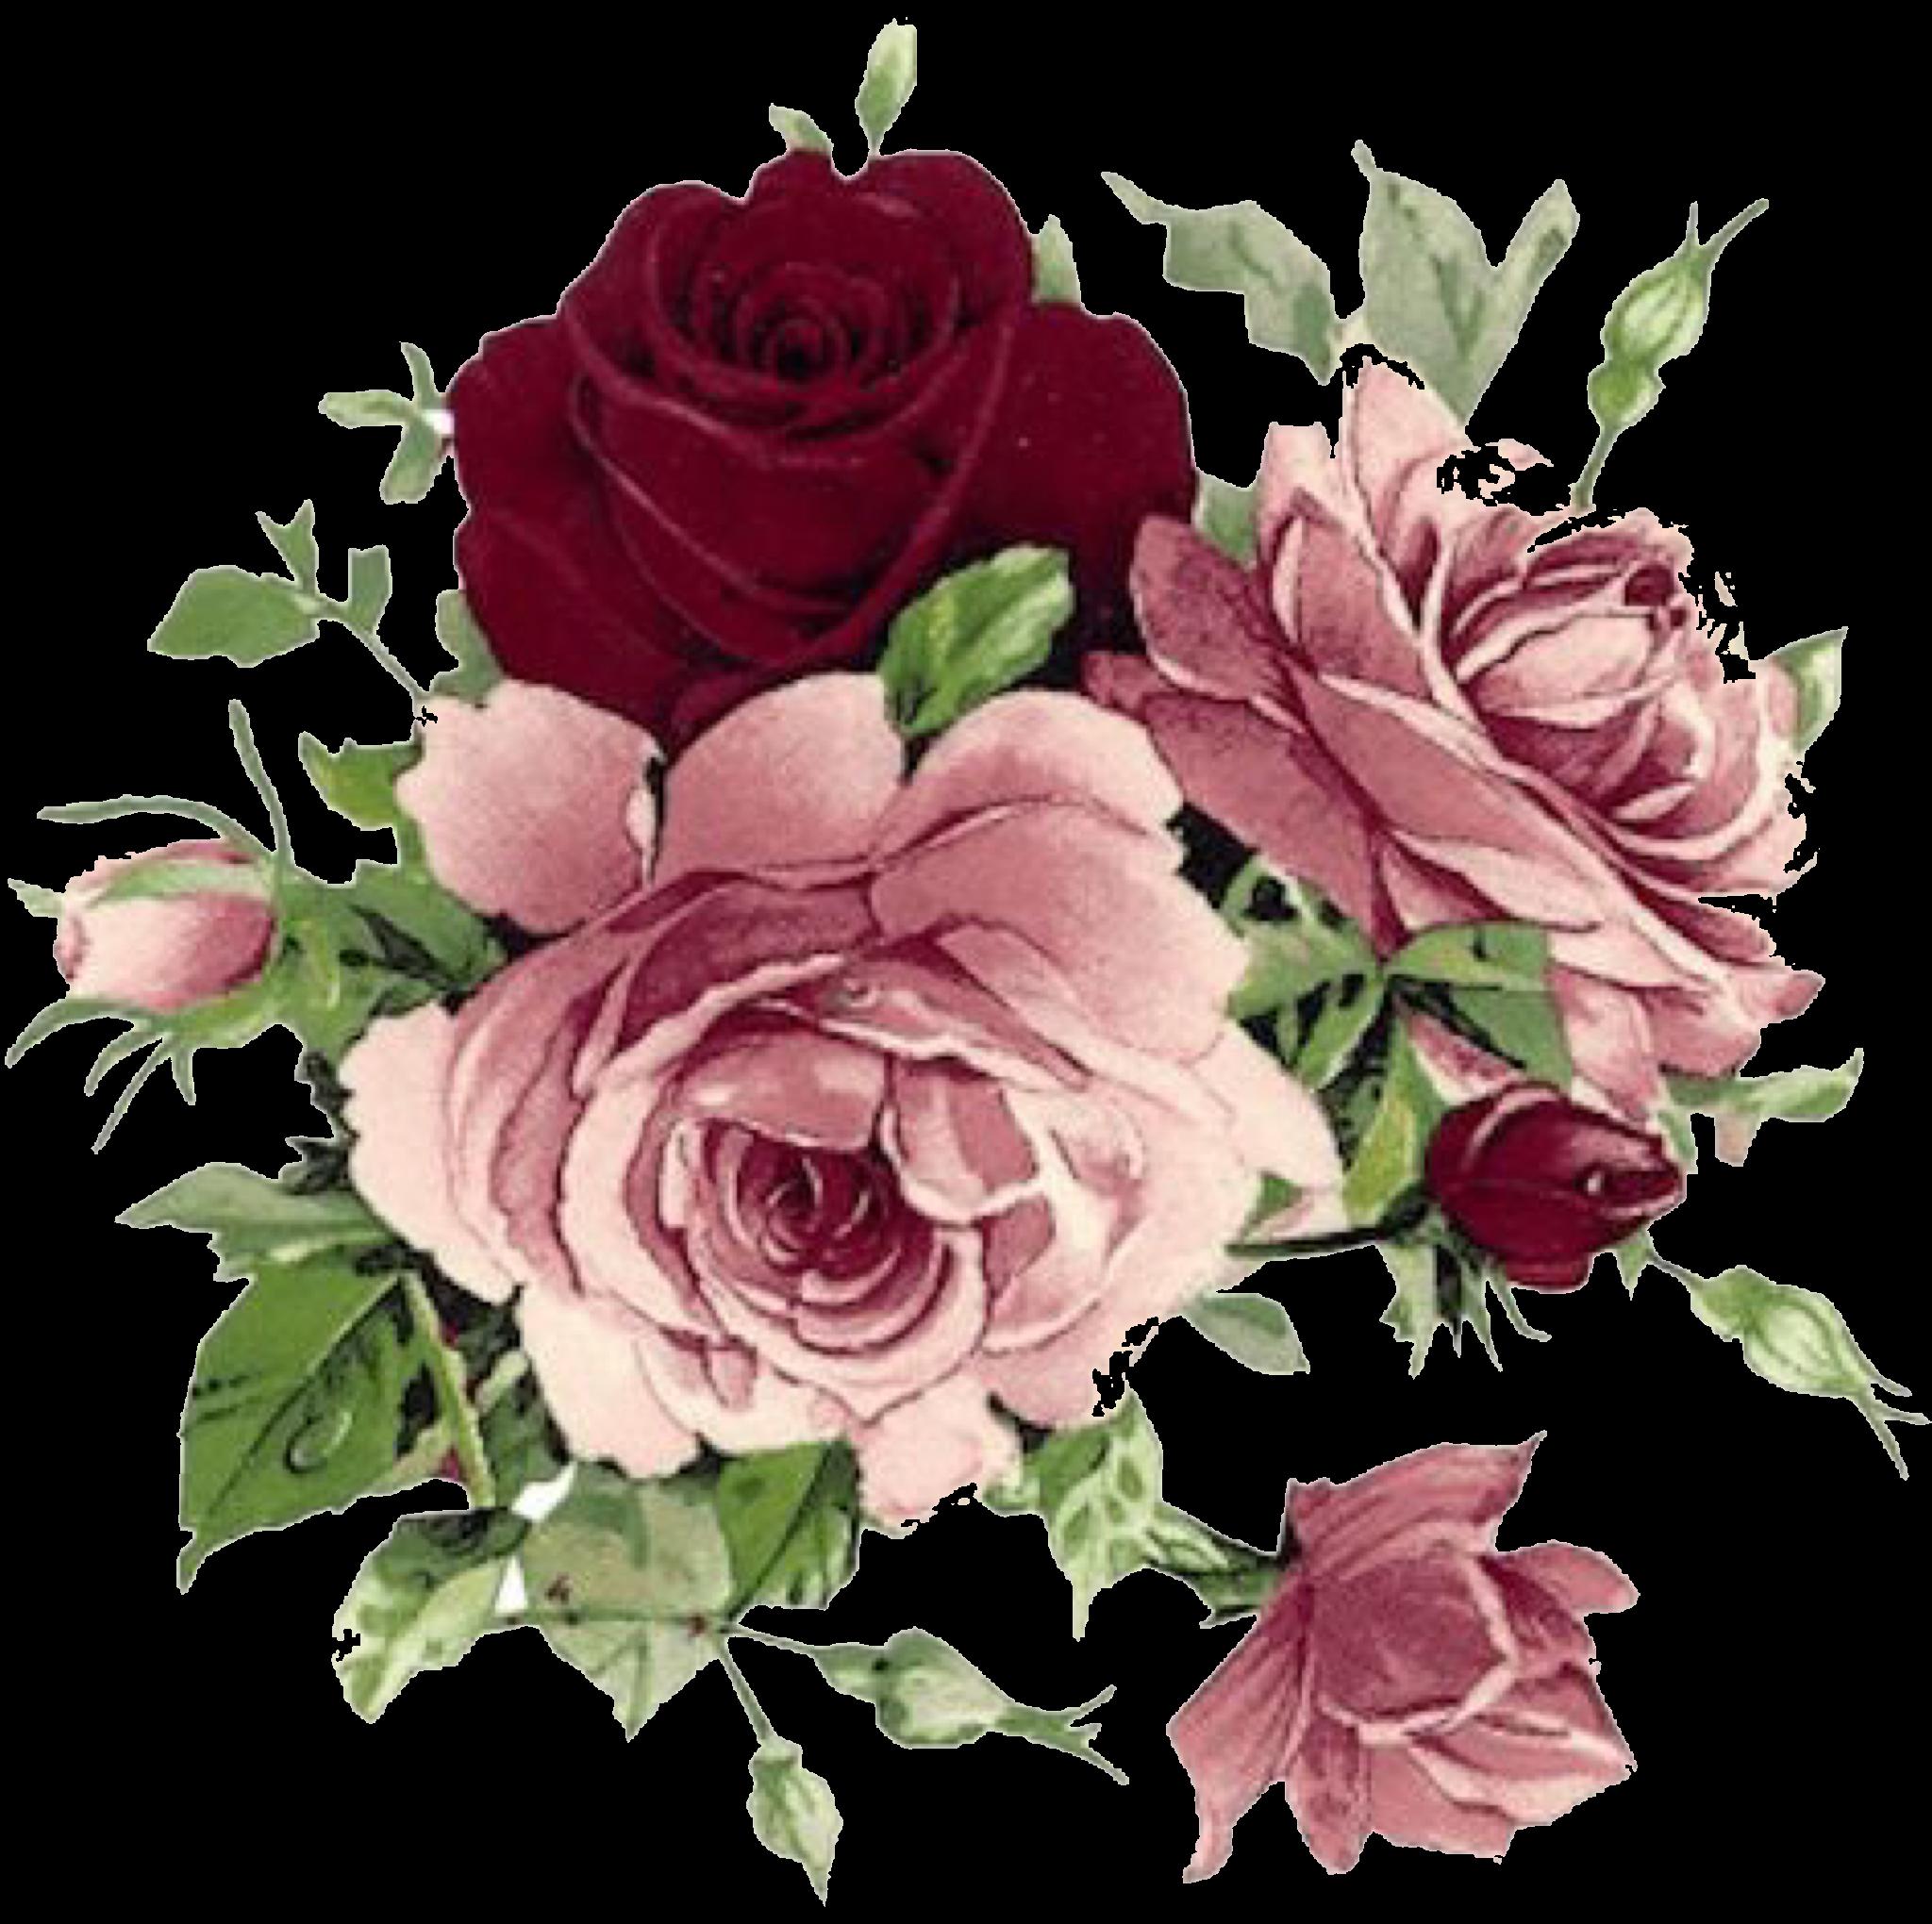 ورد ورود ورد ملون Flower زهرة Freetoedit Flower Painting Floral Painting Flower Art